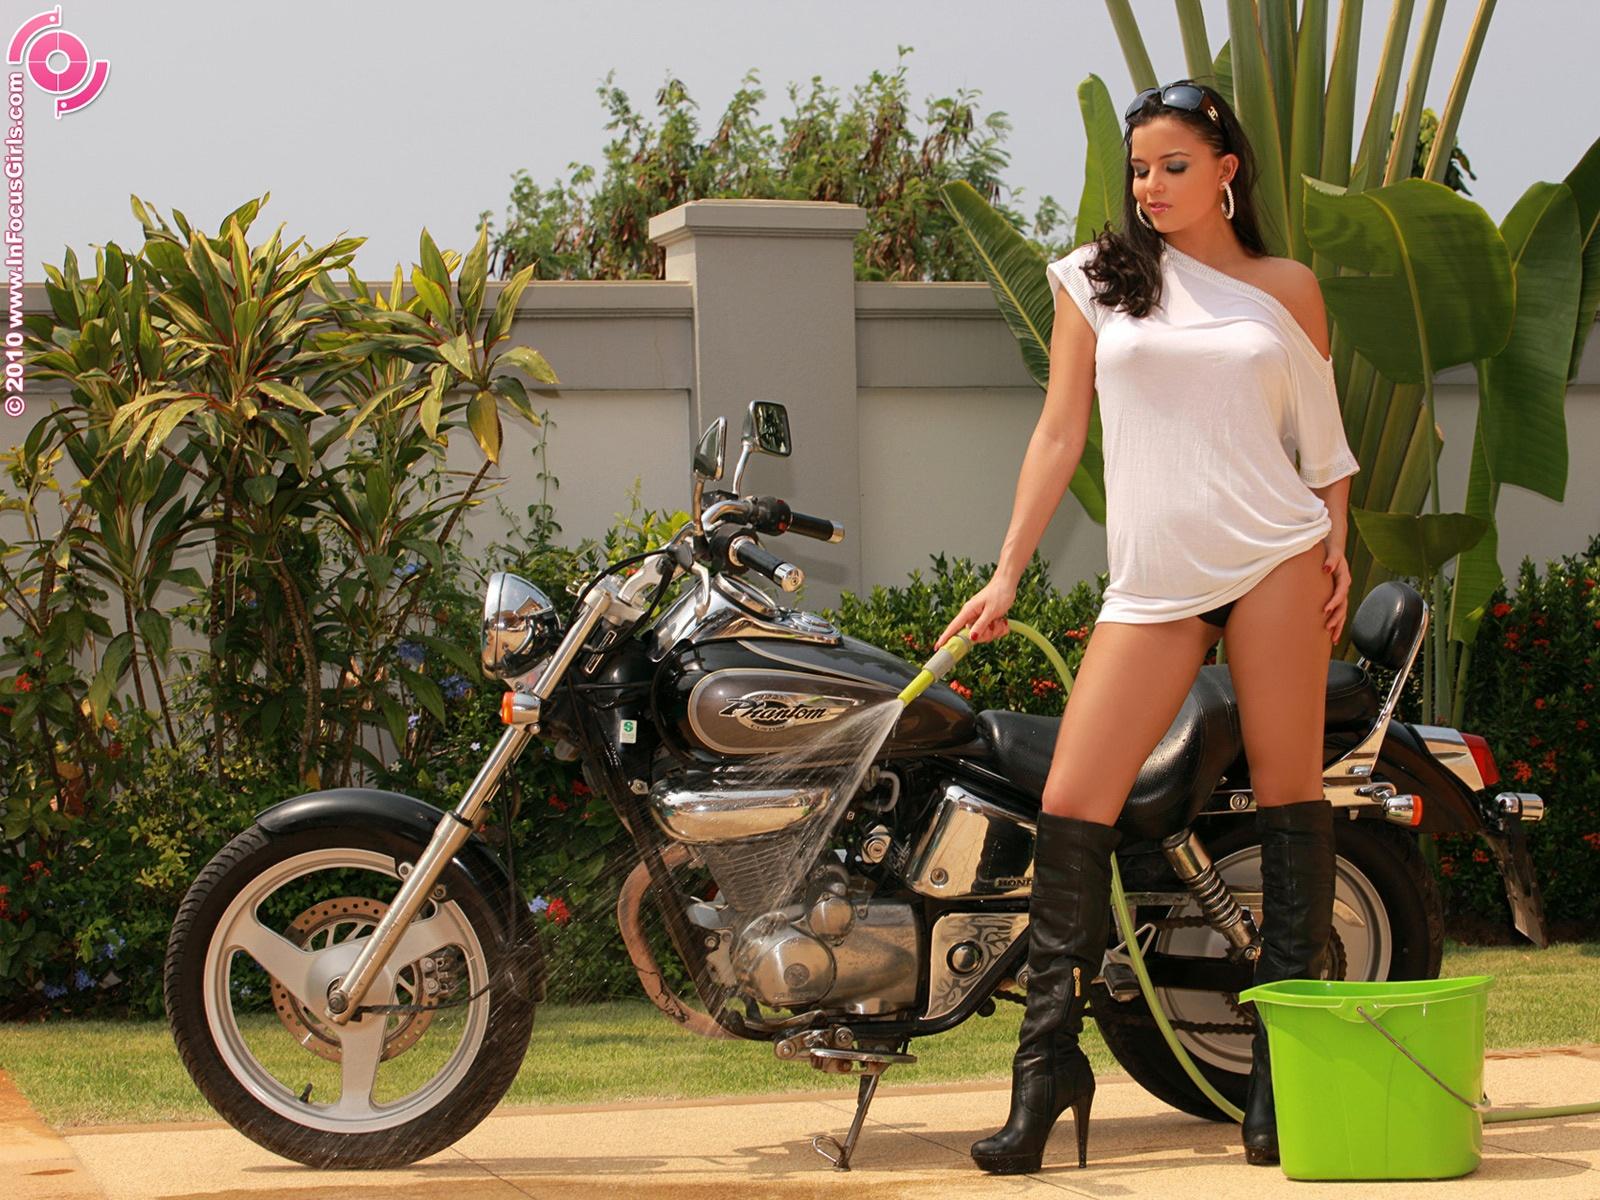 sasha cane 1600x1200 sexy nude hd wallpaper resolution size 1600x1200